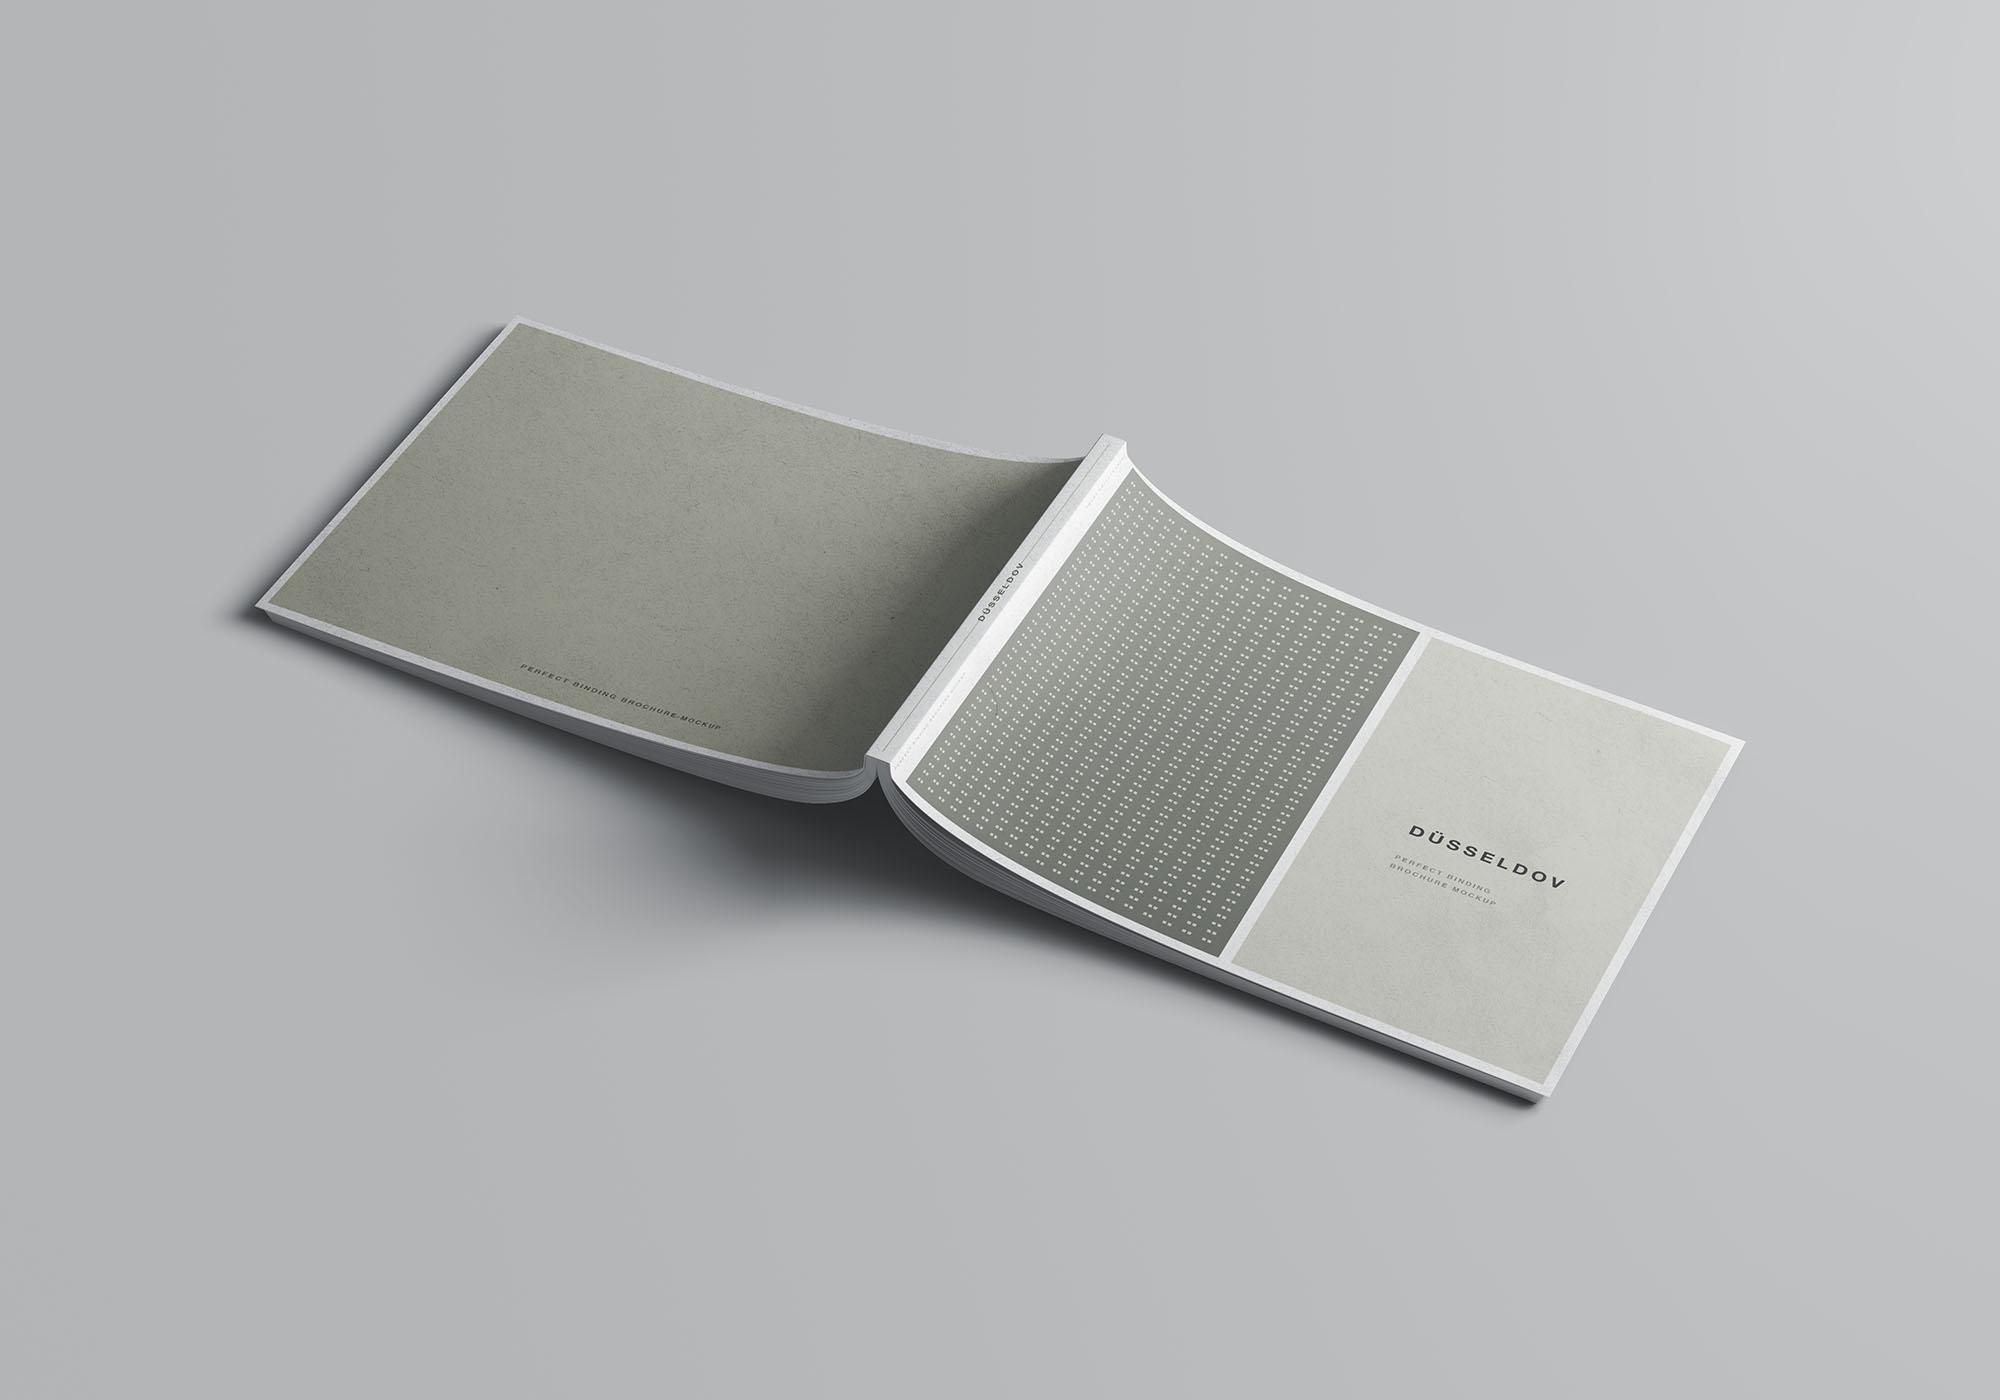 A4书籍画册杂志设计效果图样机模板 A4 Landscape Perfect Binding Brochure Mockup插图(1)